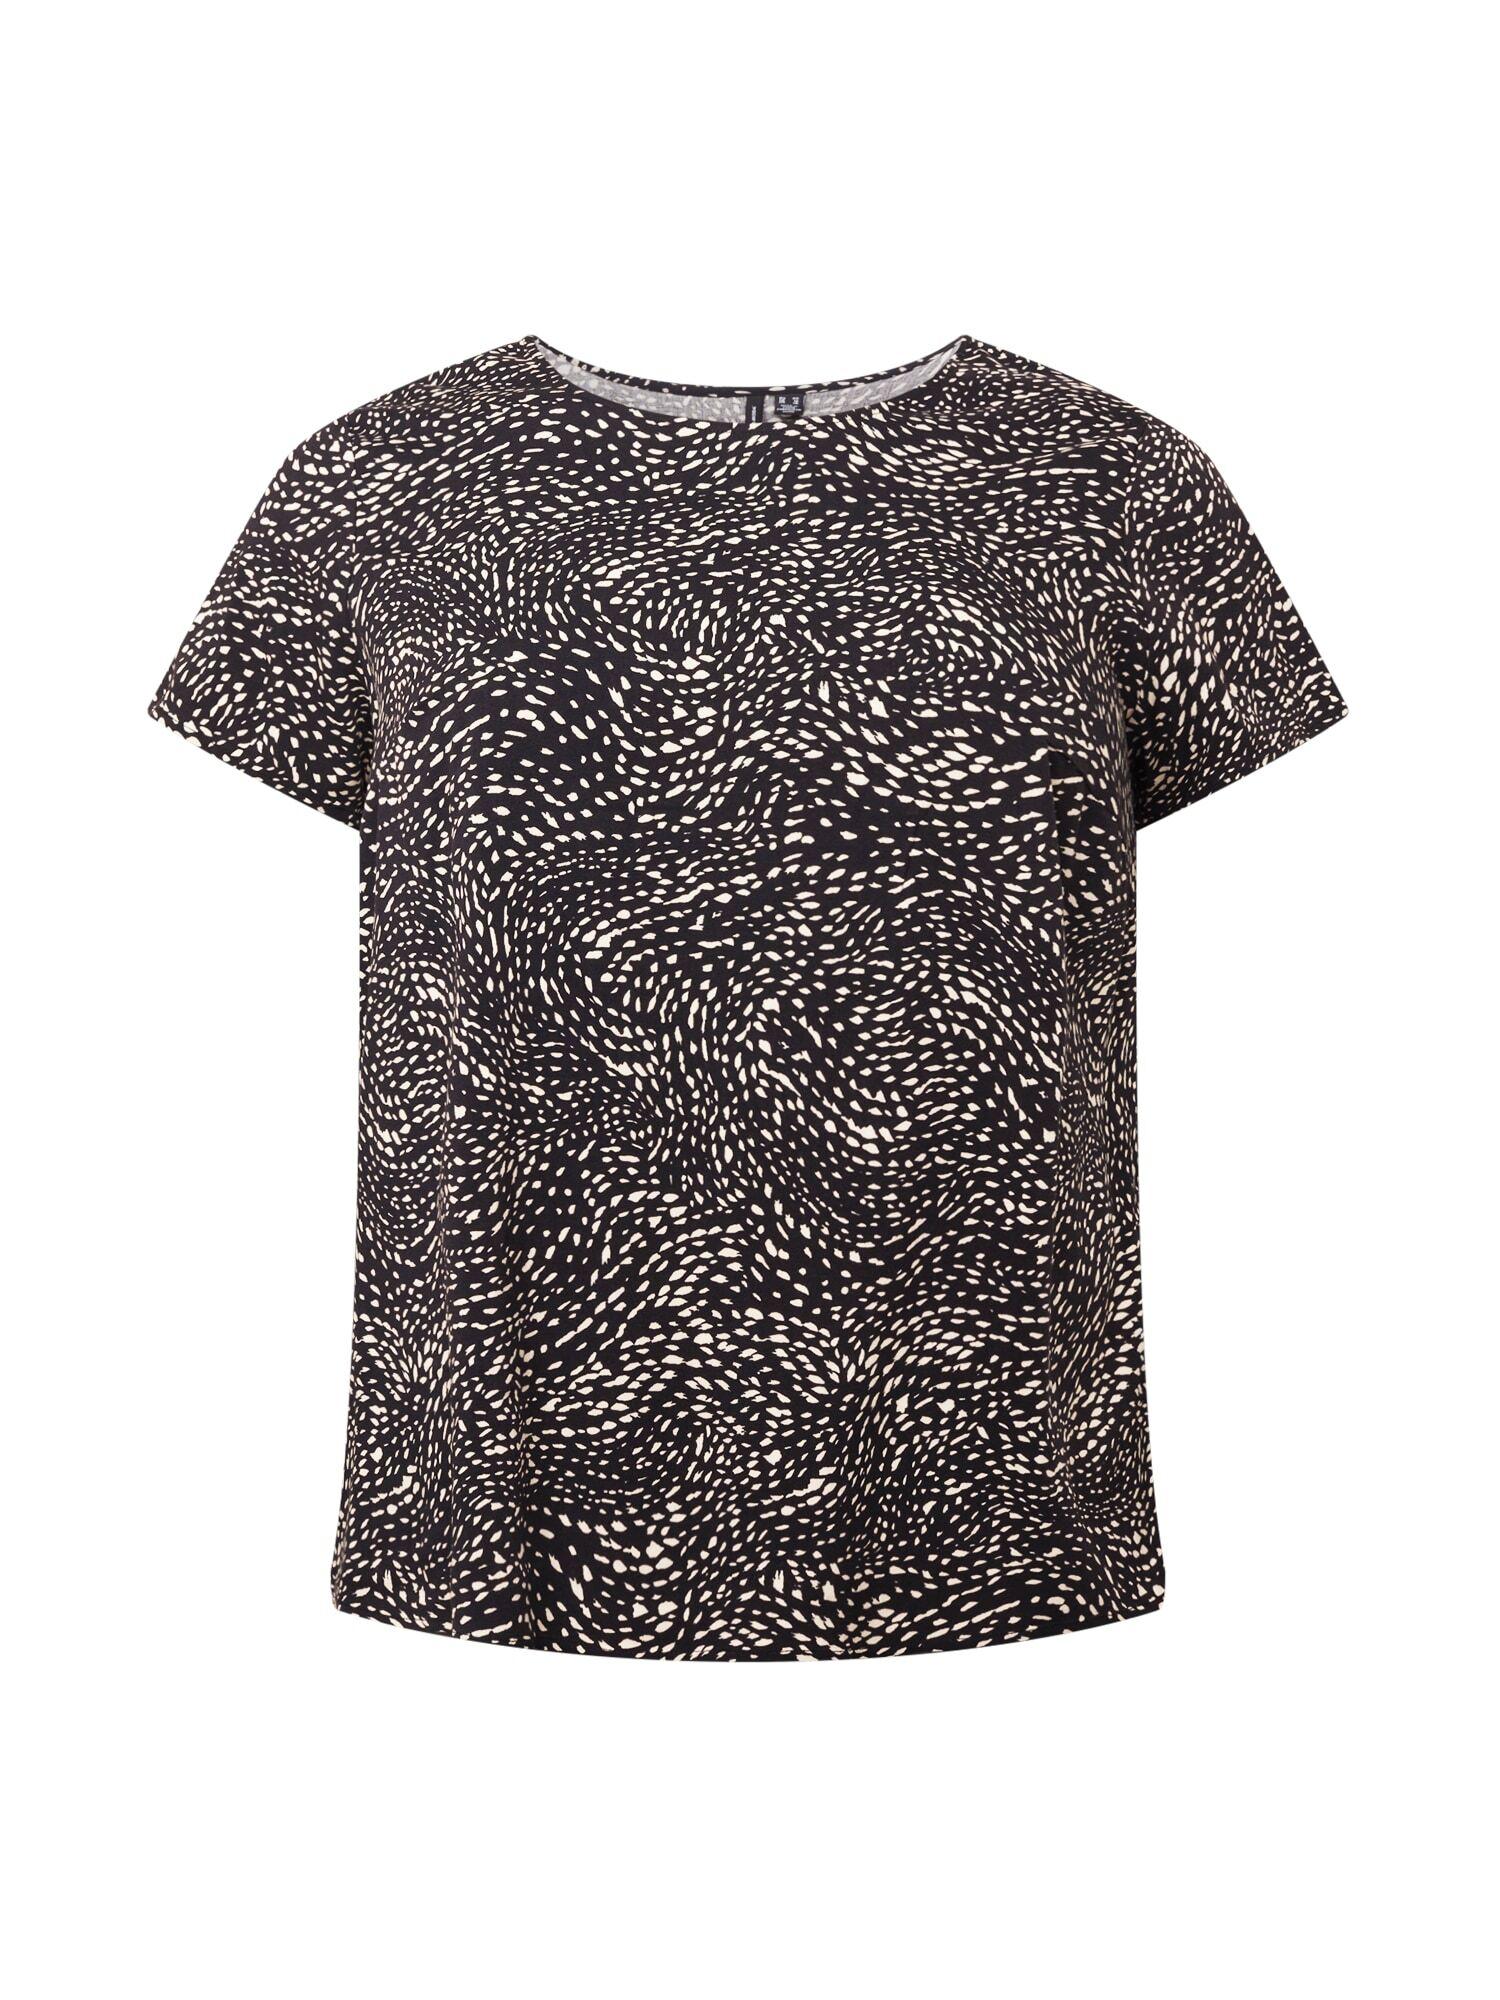 Vero Moda Curve T-shirt 'BACA'  - Noir - Taille: 52 - female